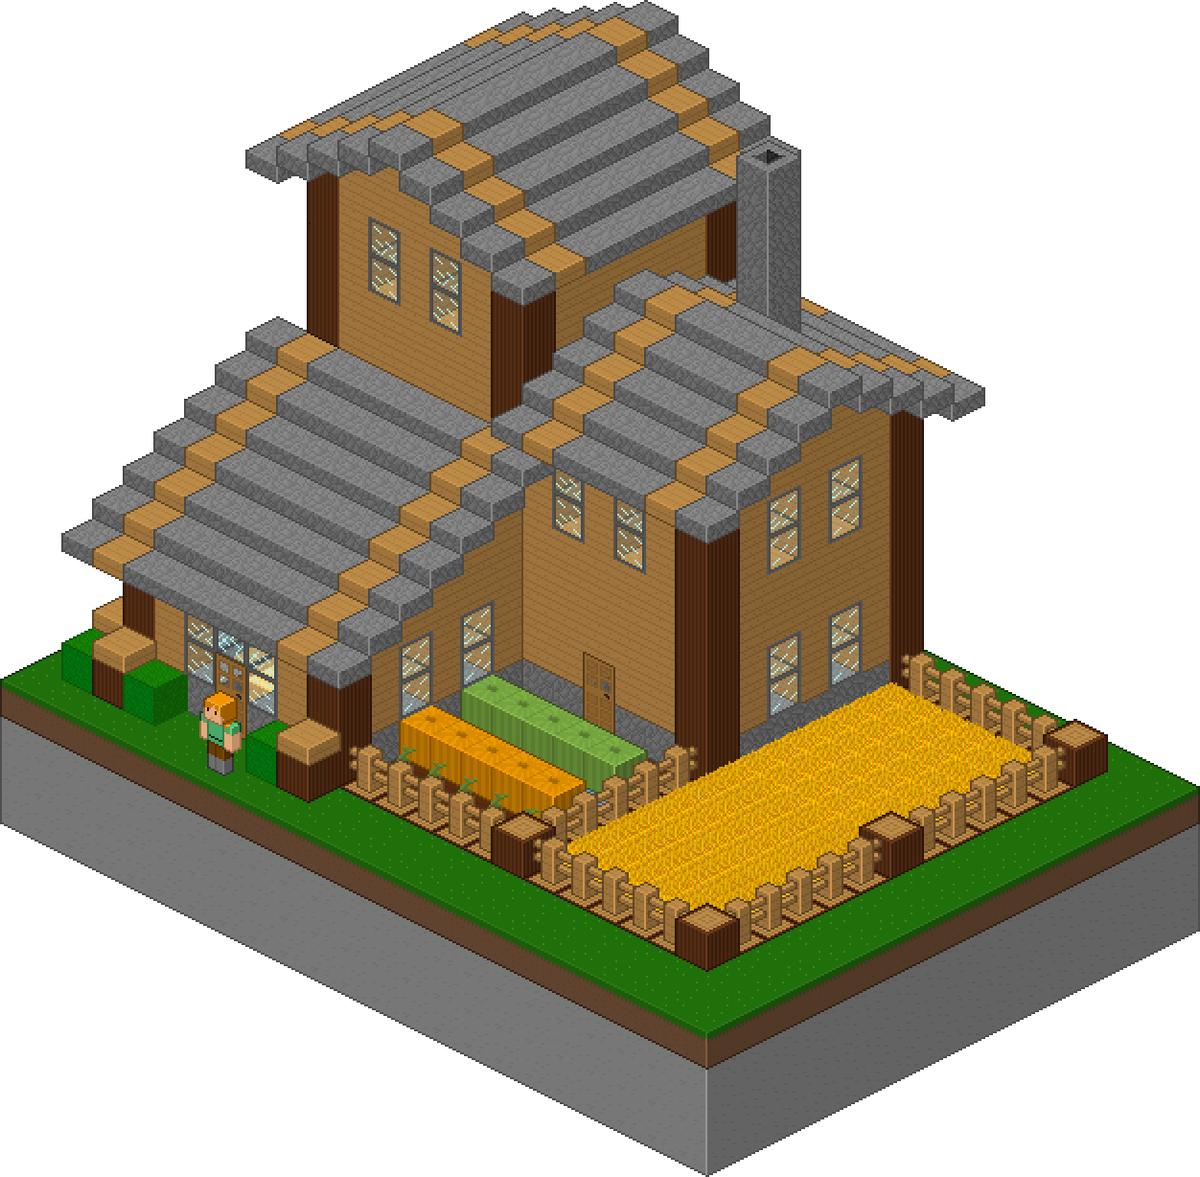 Minecraftfr على تويتر Une Maison En Pixel Art Httptco